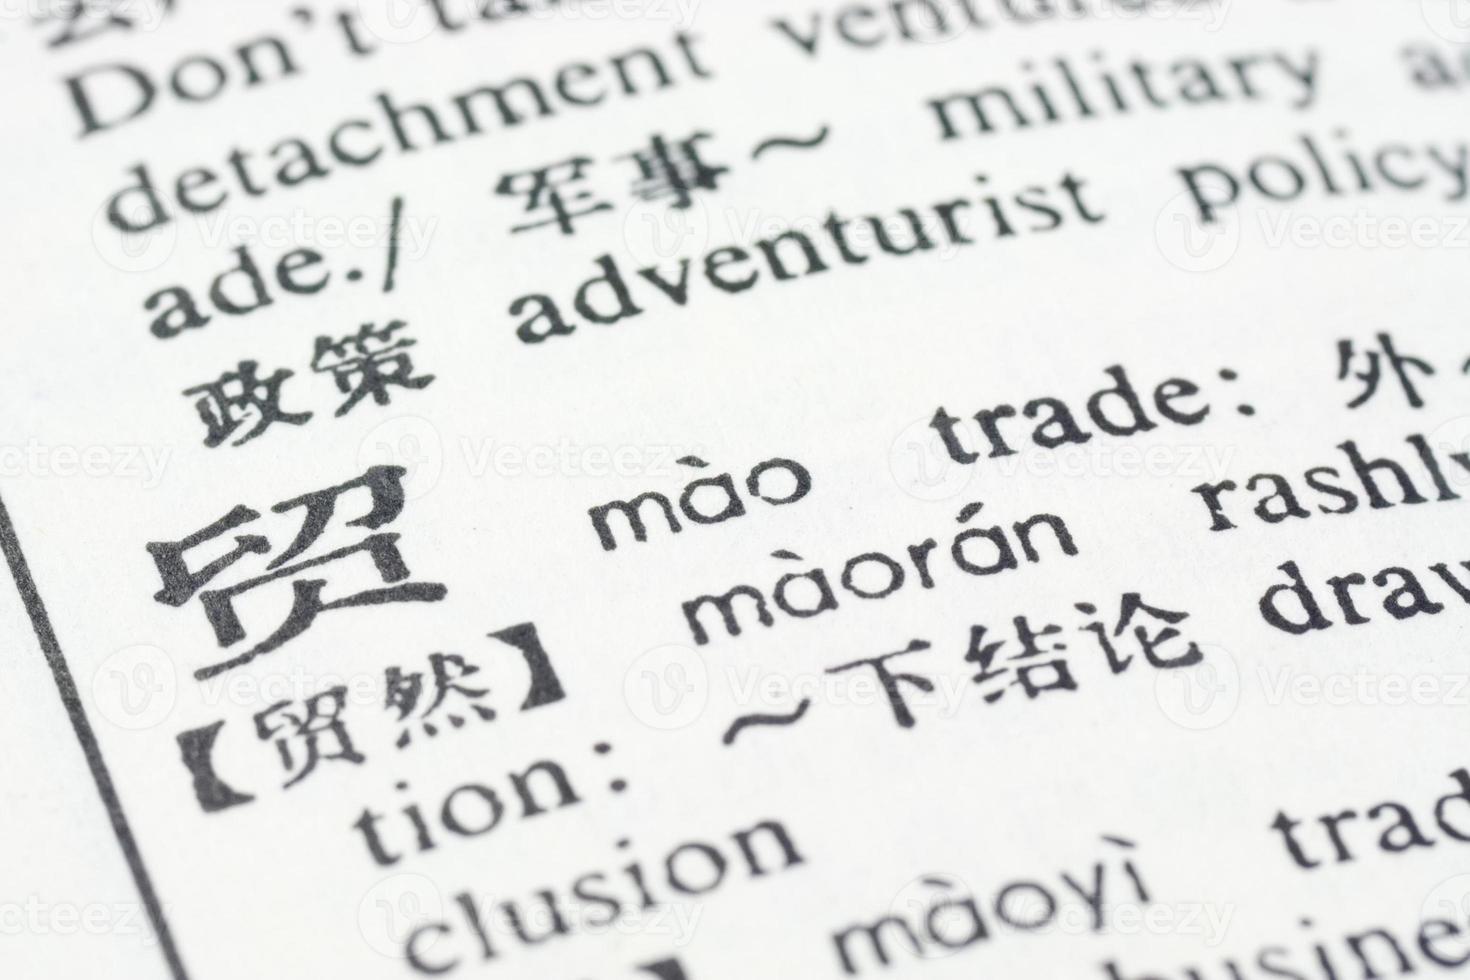 Handel in Chinesisch geschrieben foto